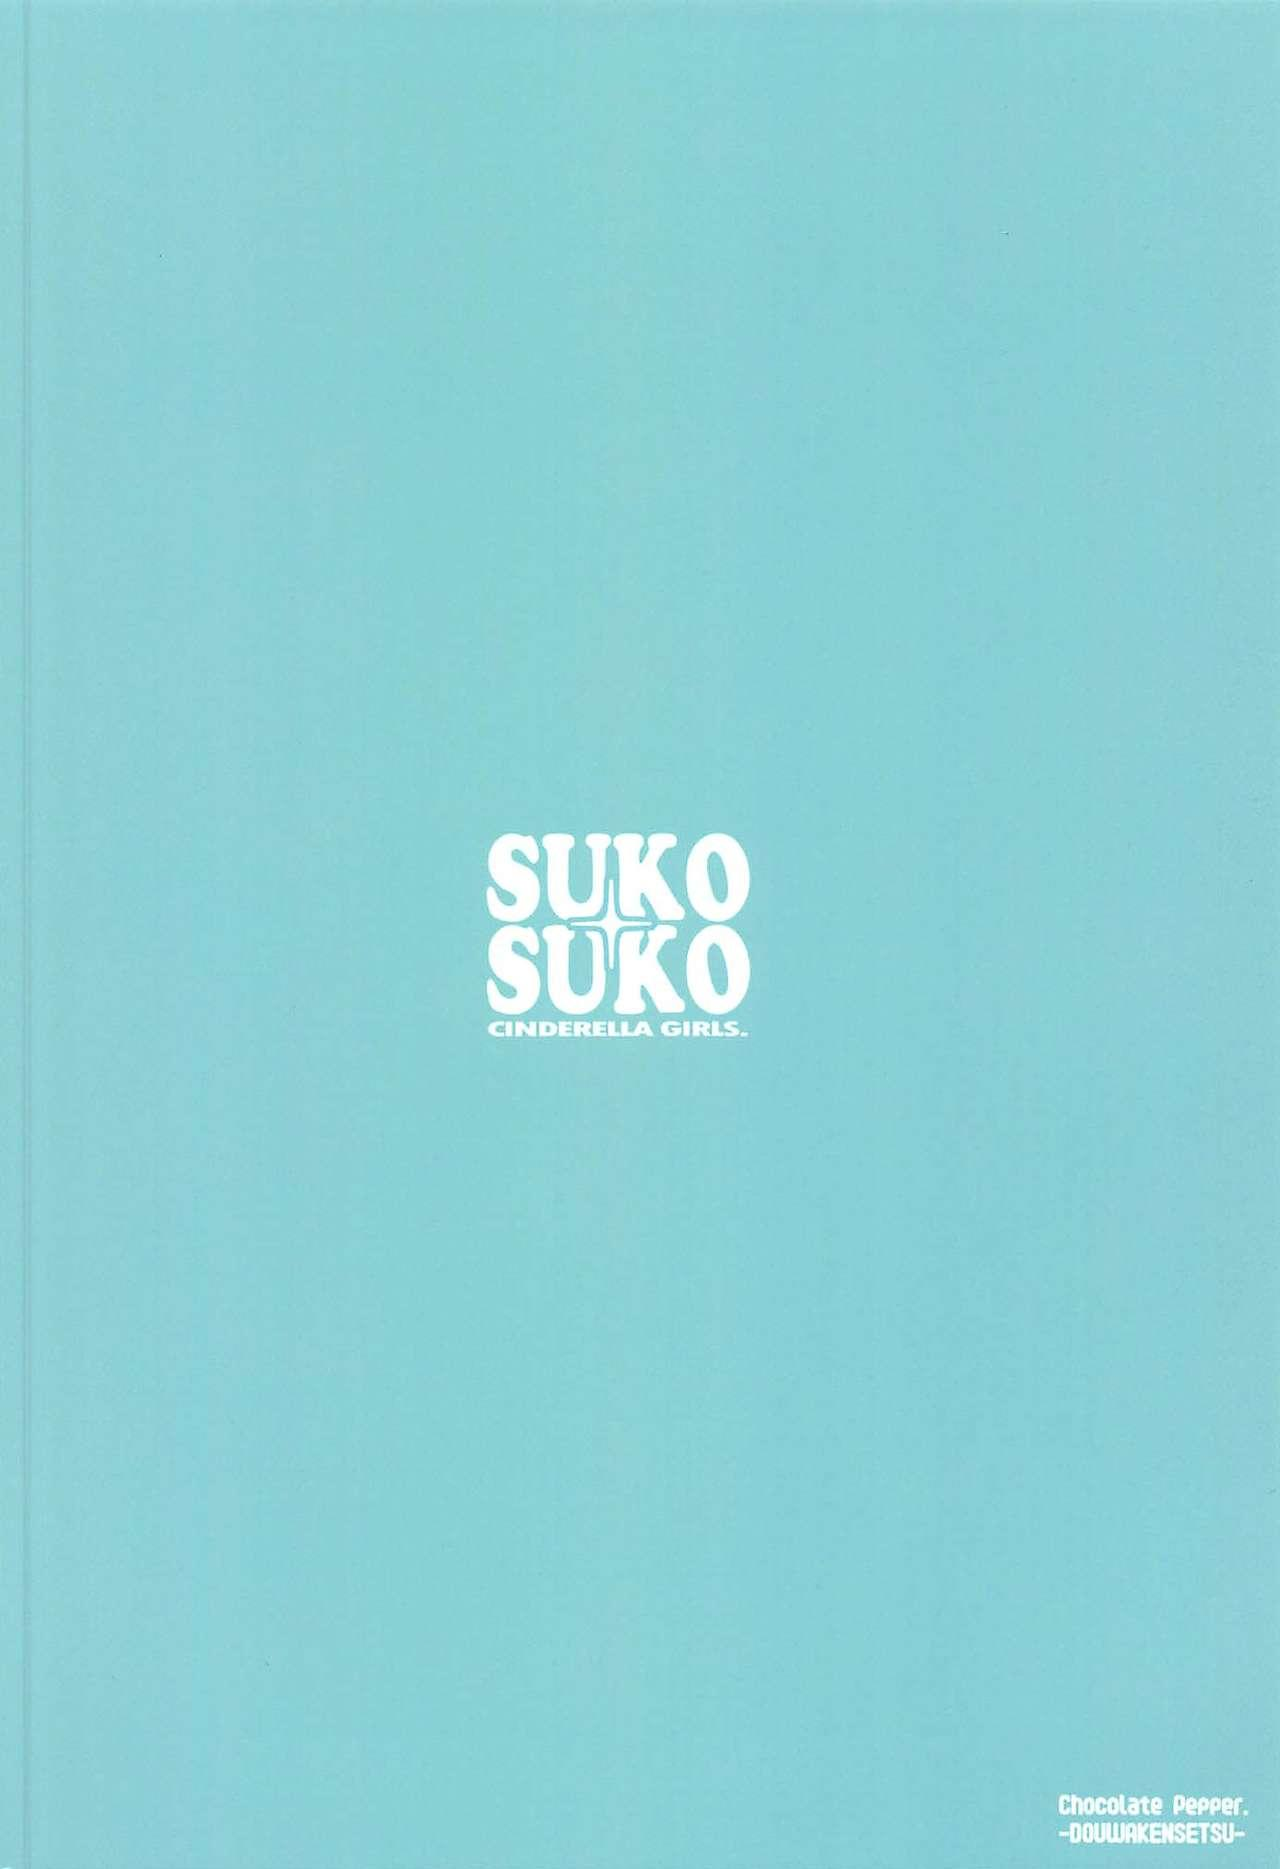 SUKO + SUKO 25